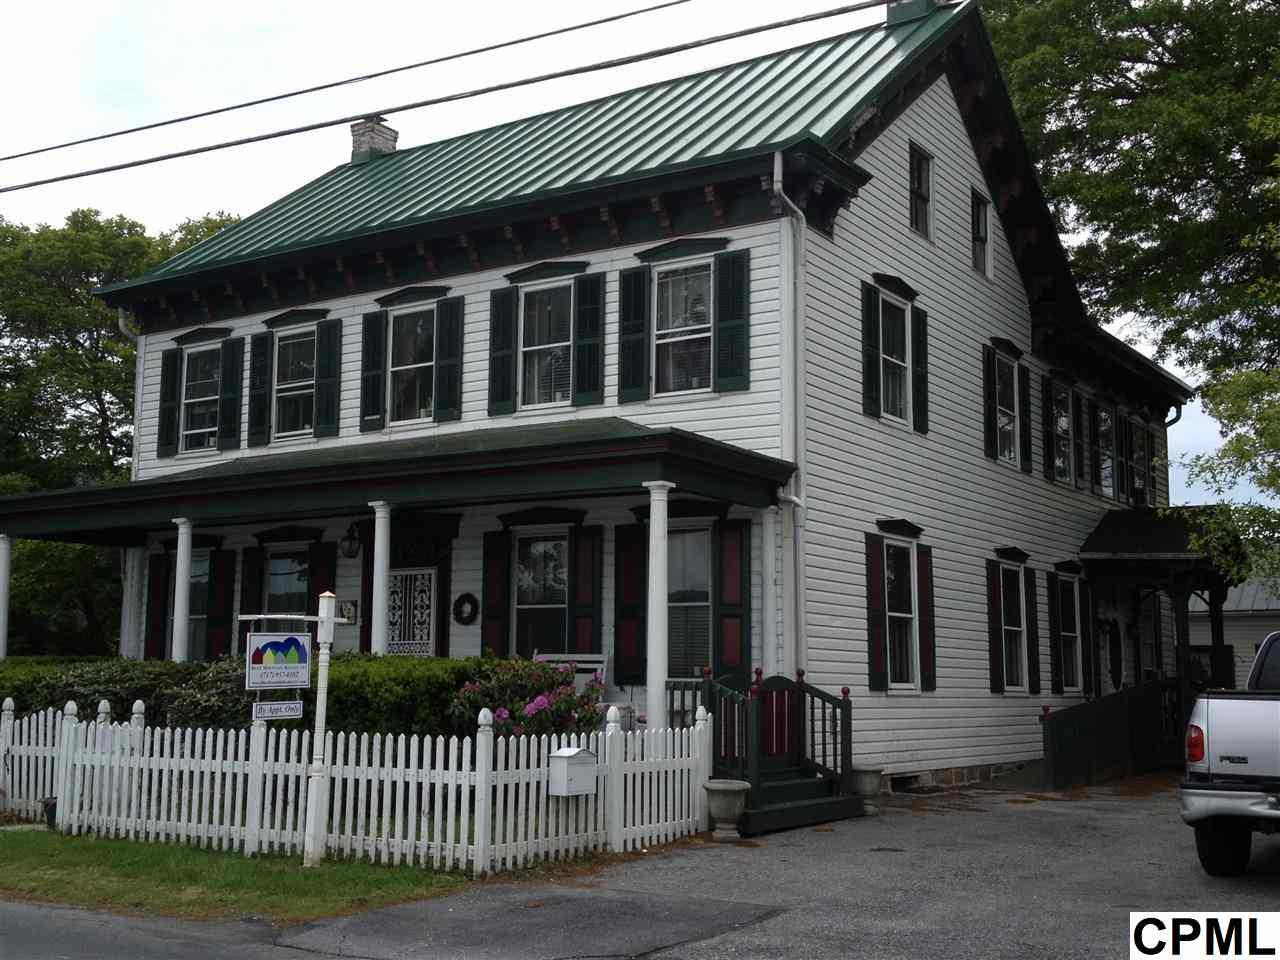 Rental Homes for Rent, ListingId:30183113, location: 306 S Main Marysville 17053